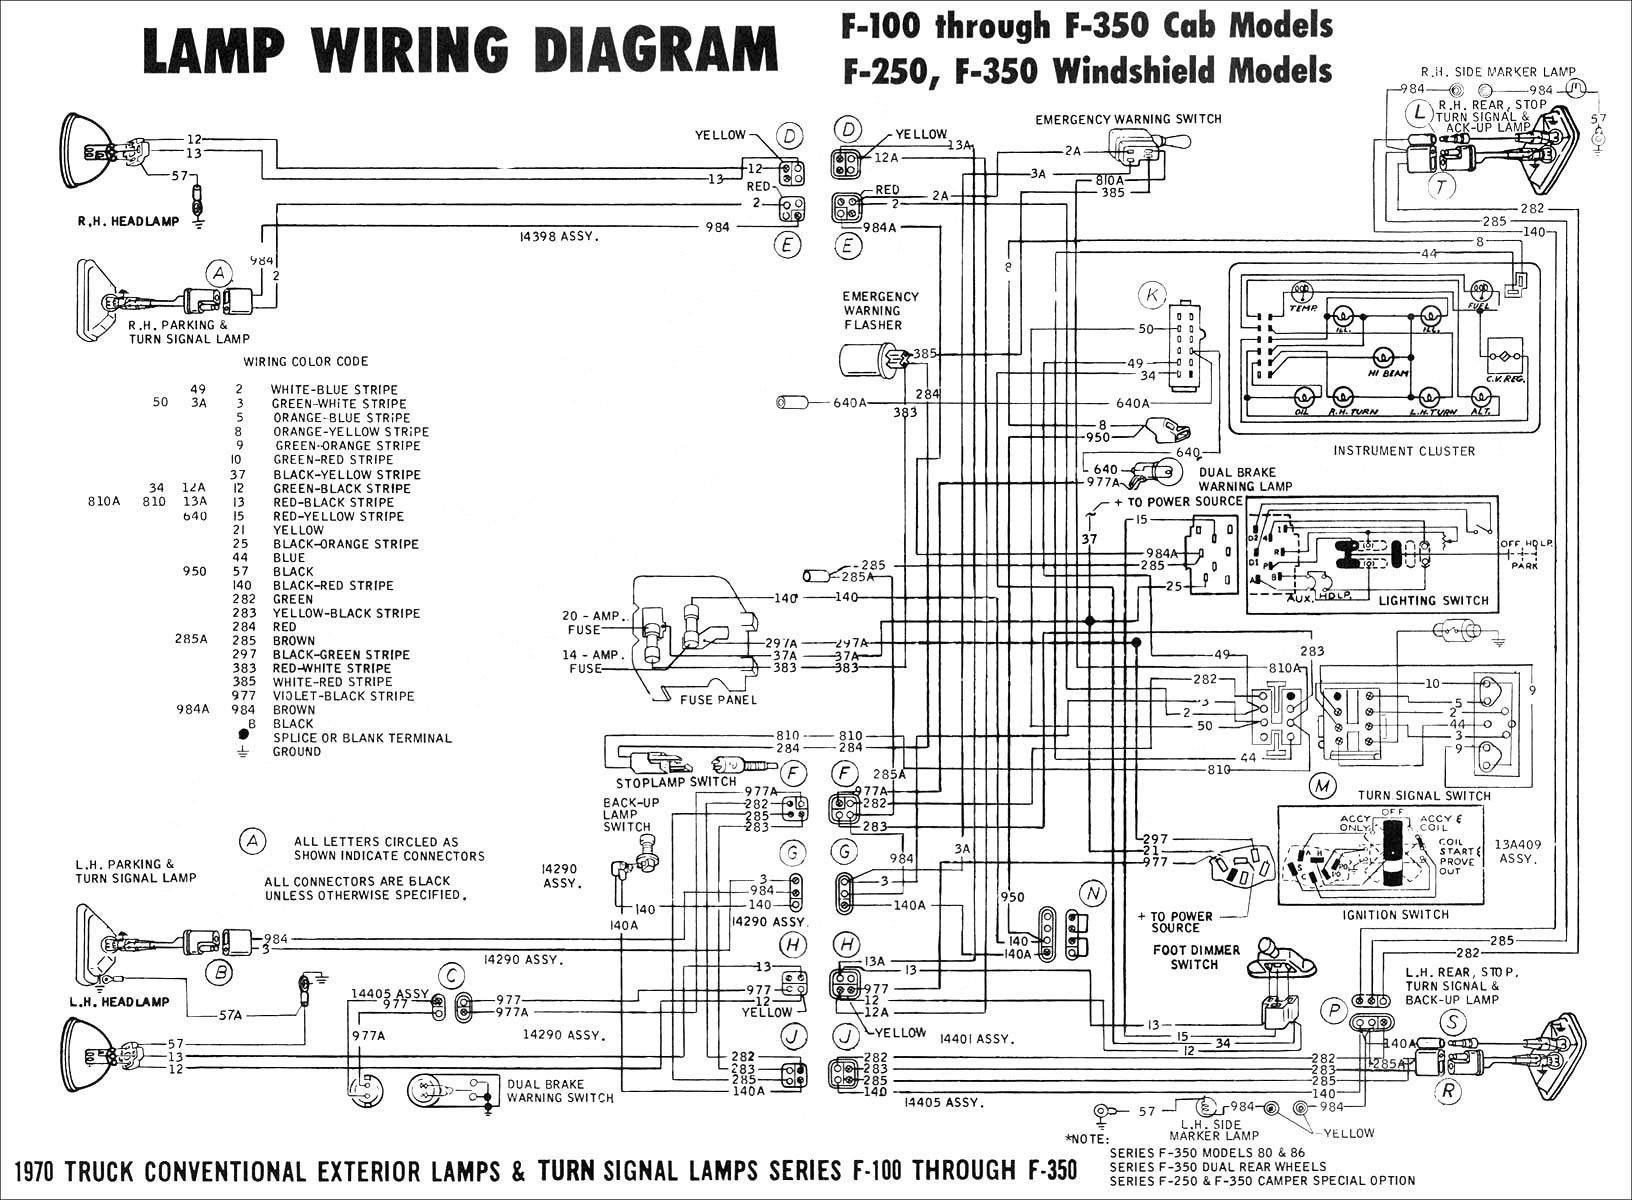 Ford Brake Master Cylinder Diagram 2008 ford F350 Wiring Diagram Inspirational F250 Daigram Throughout Of Ford Brake Master Cylinder Diagram